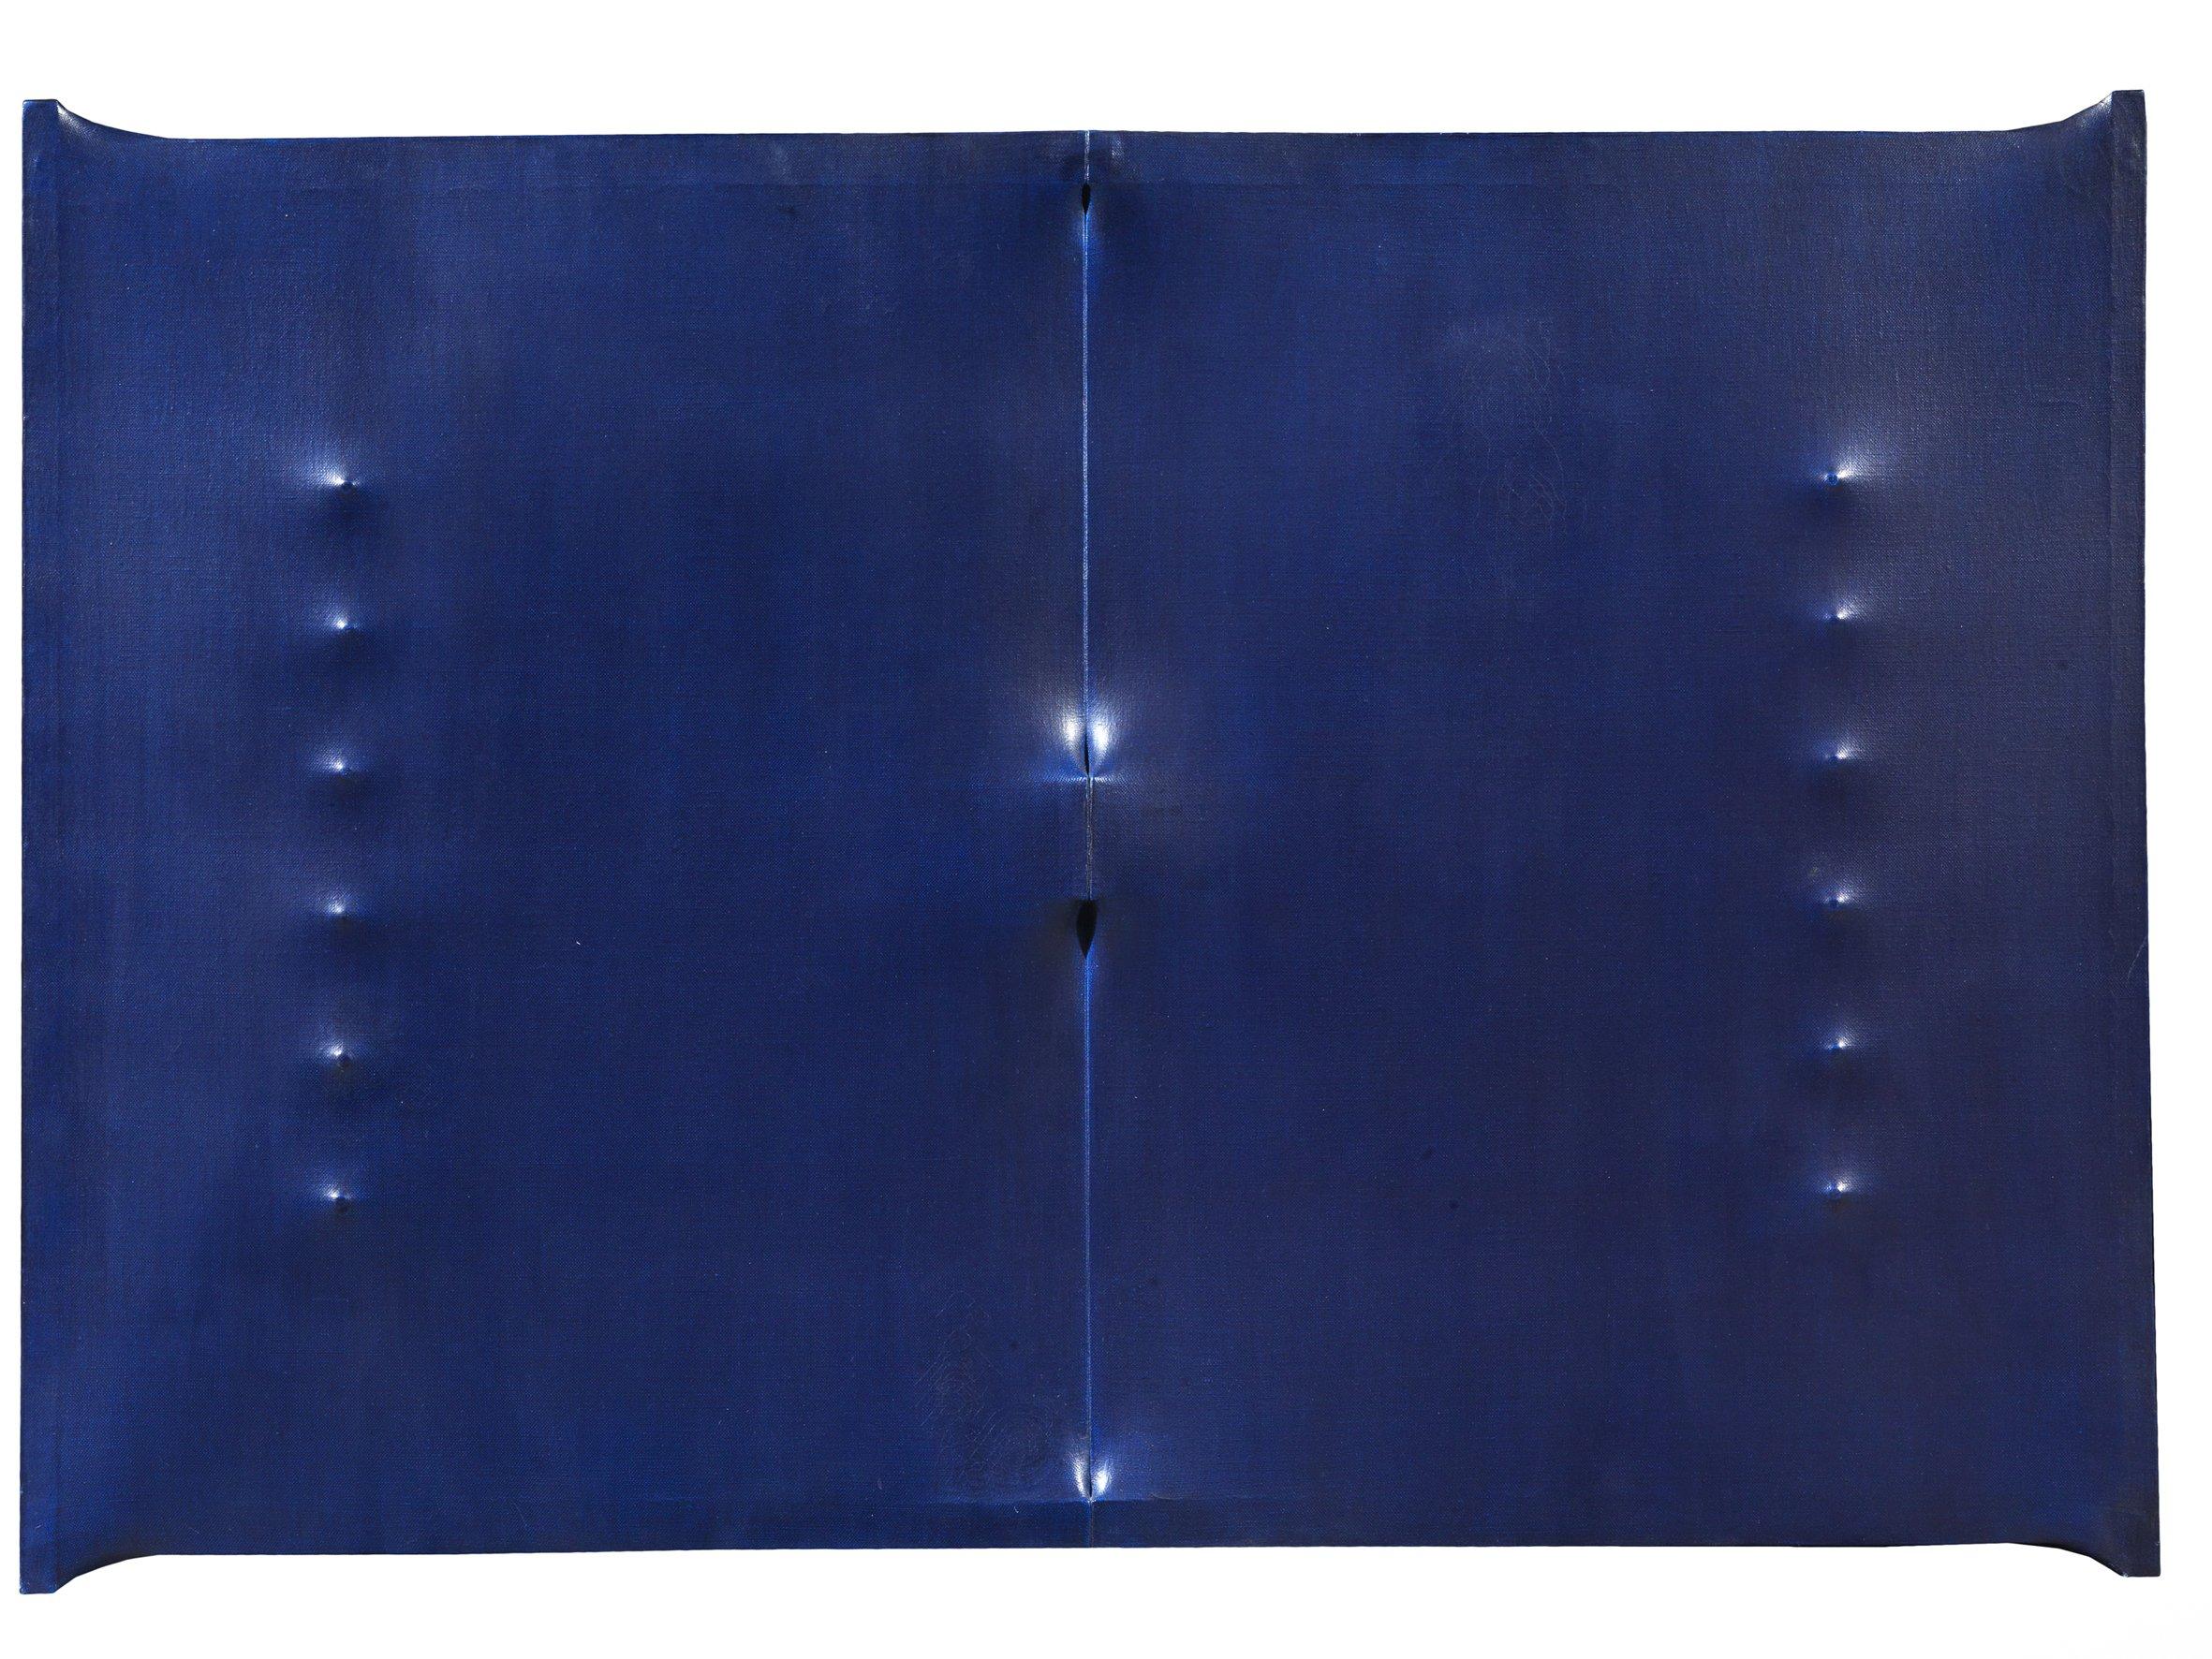 Enrico Castellani, Superficie blu scuro, 1963, acrilico su tela estroflessa, 84x120x5 cm